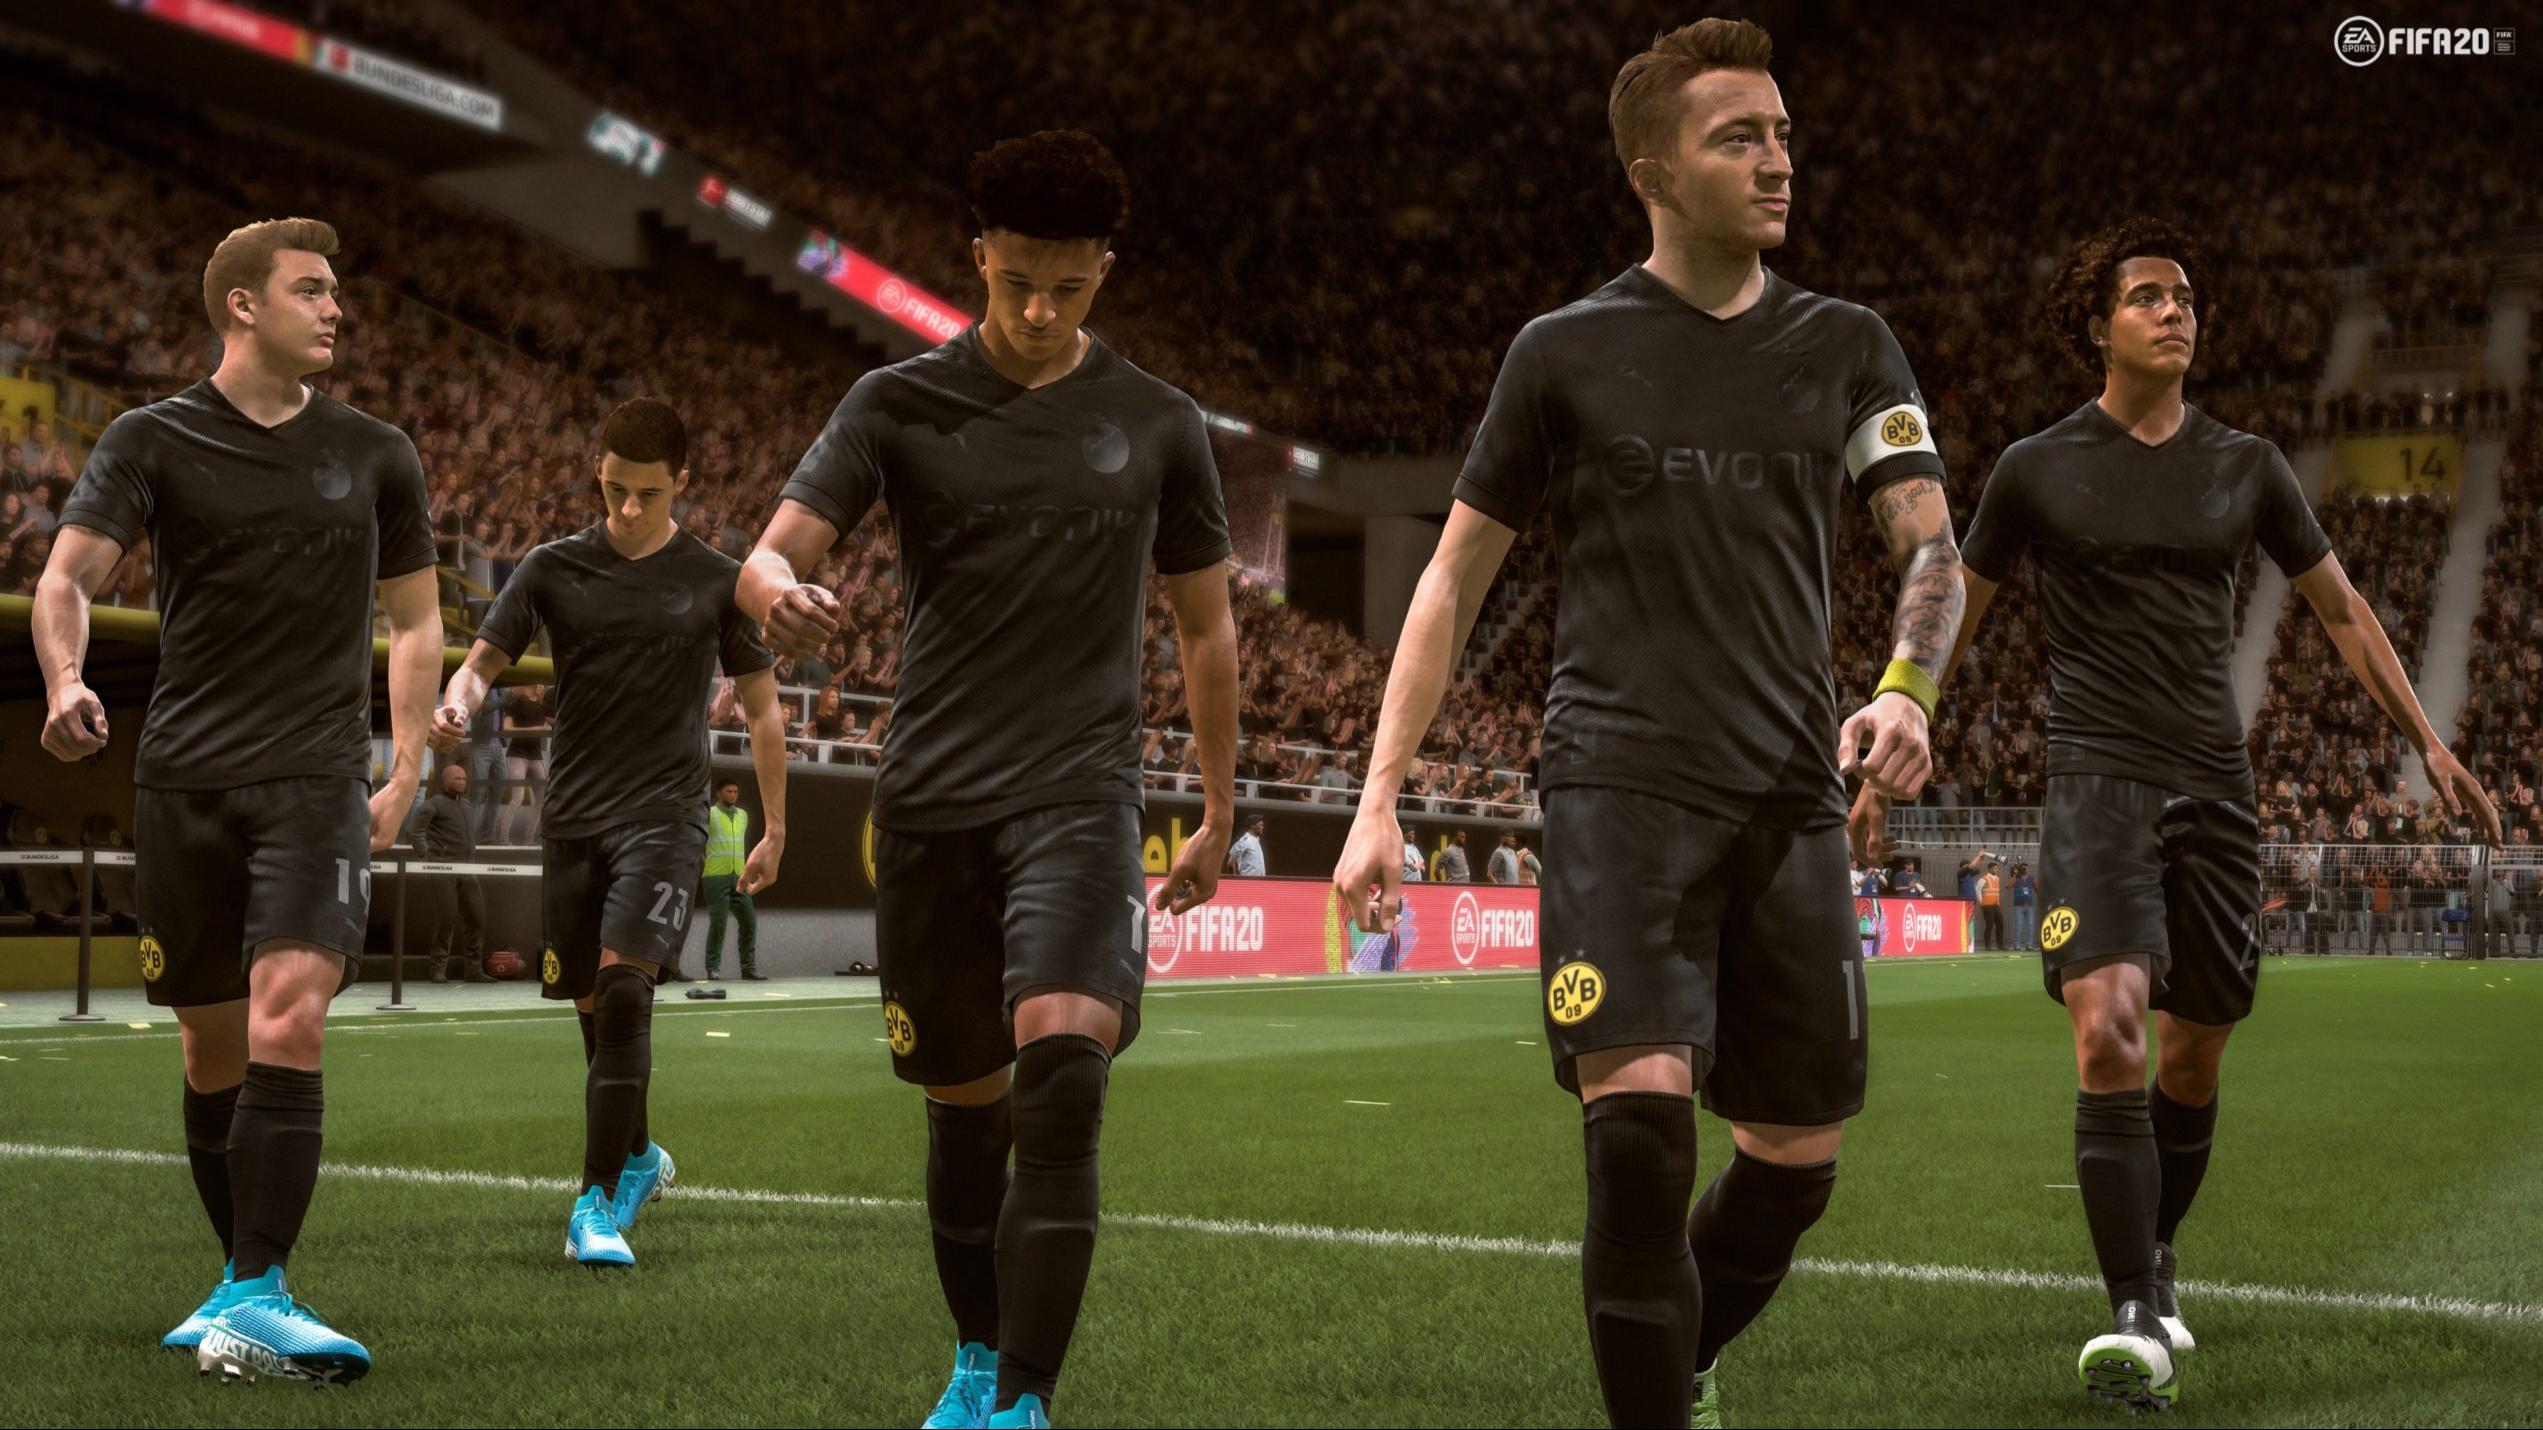 Borussia Dortmund S Stunning Blackout Kit Is Now In Fifa 20 Sportbible